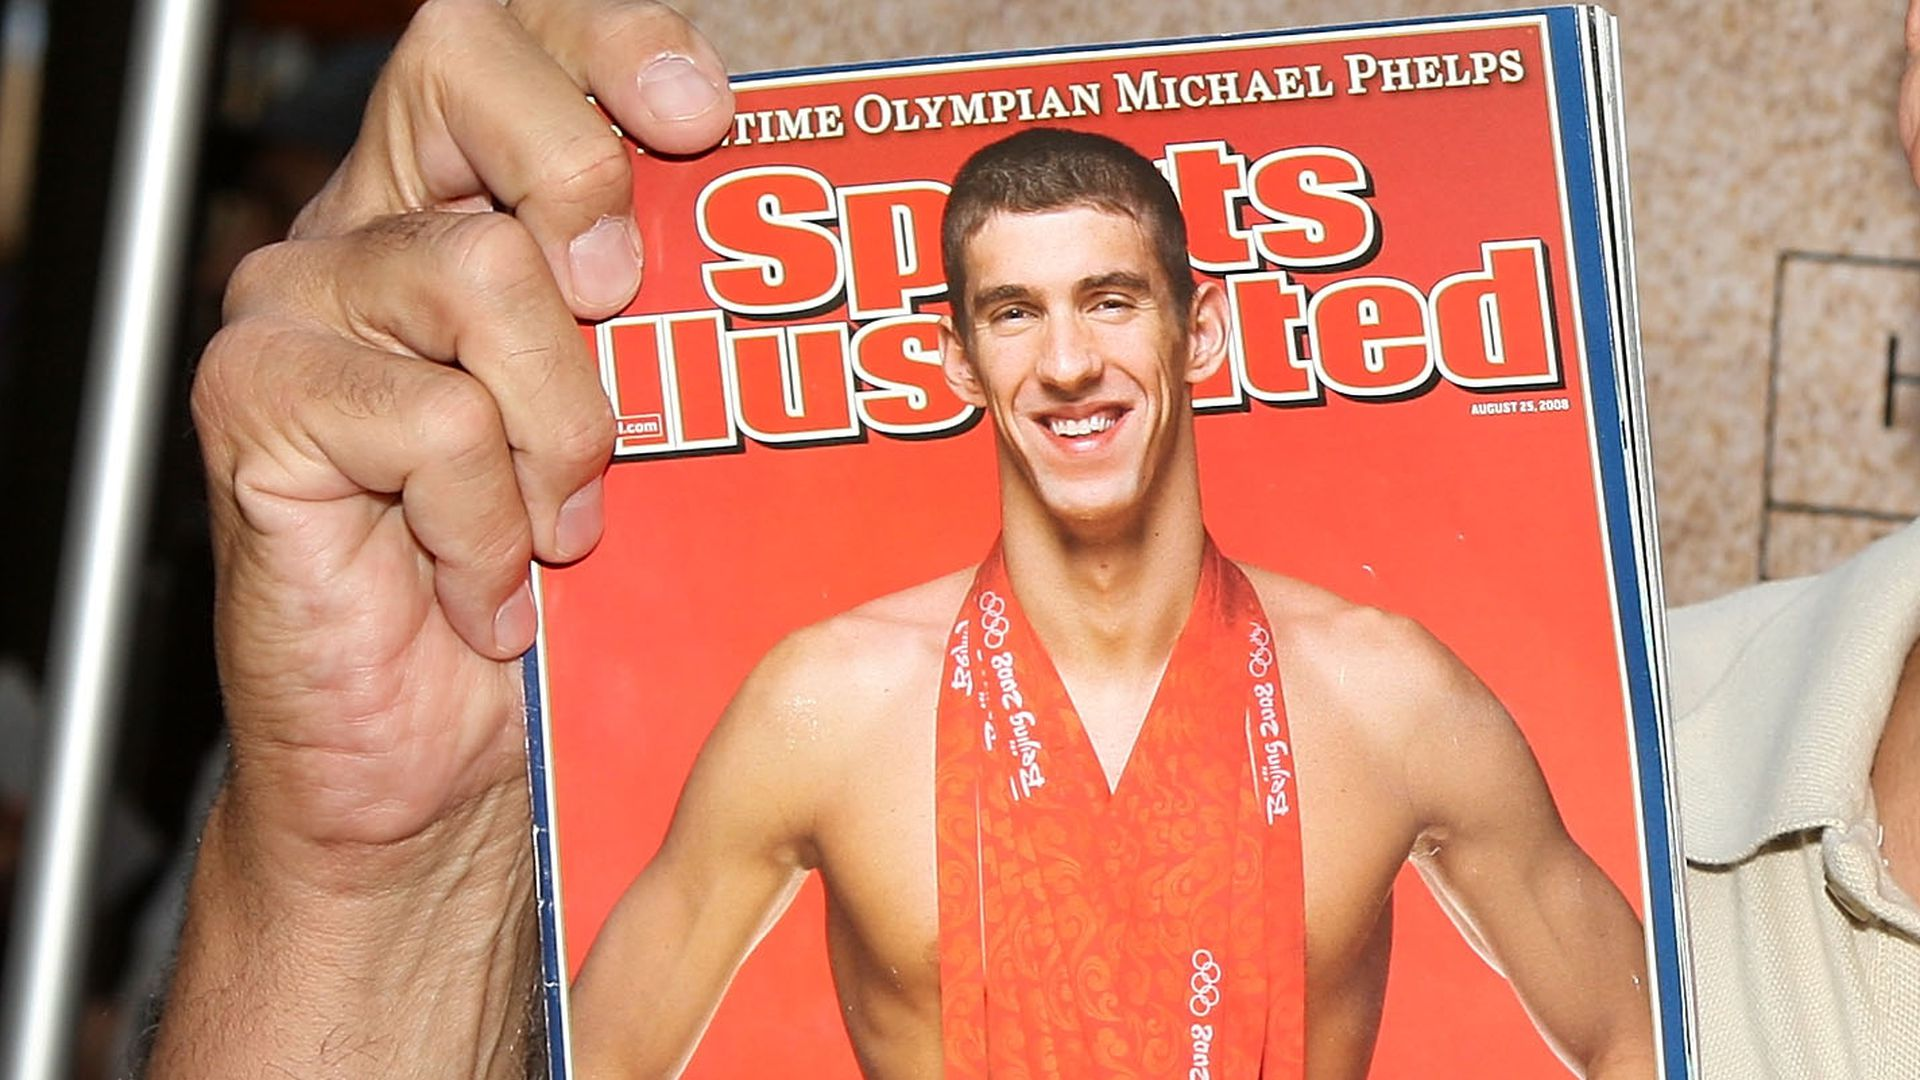 Meredith sells Sports Illustrated